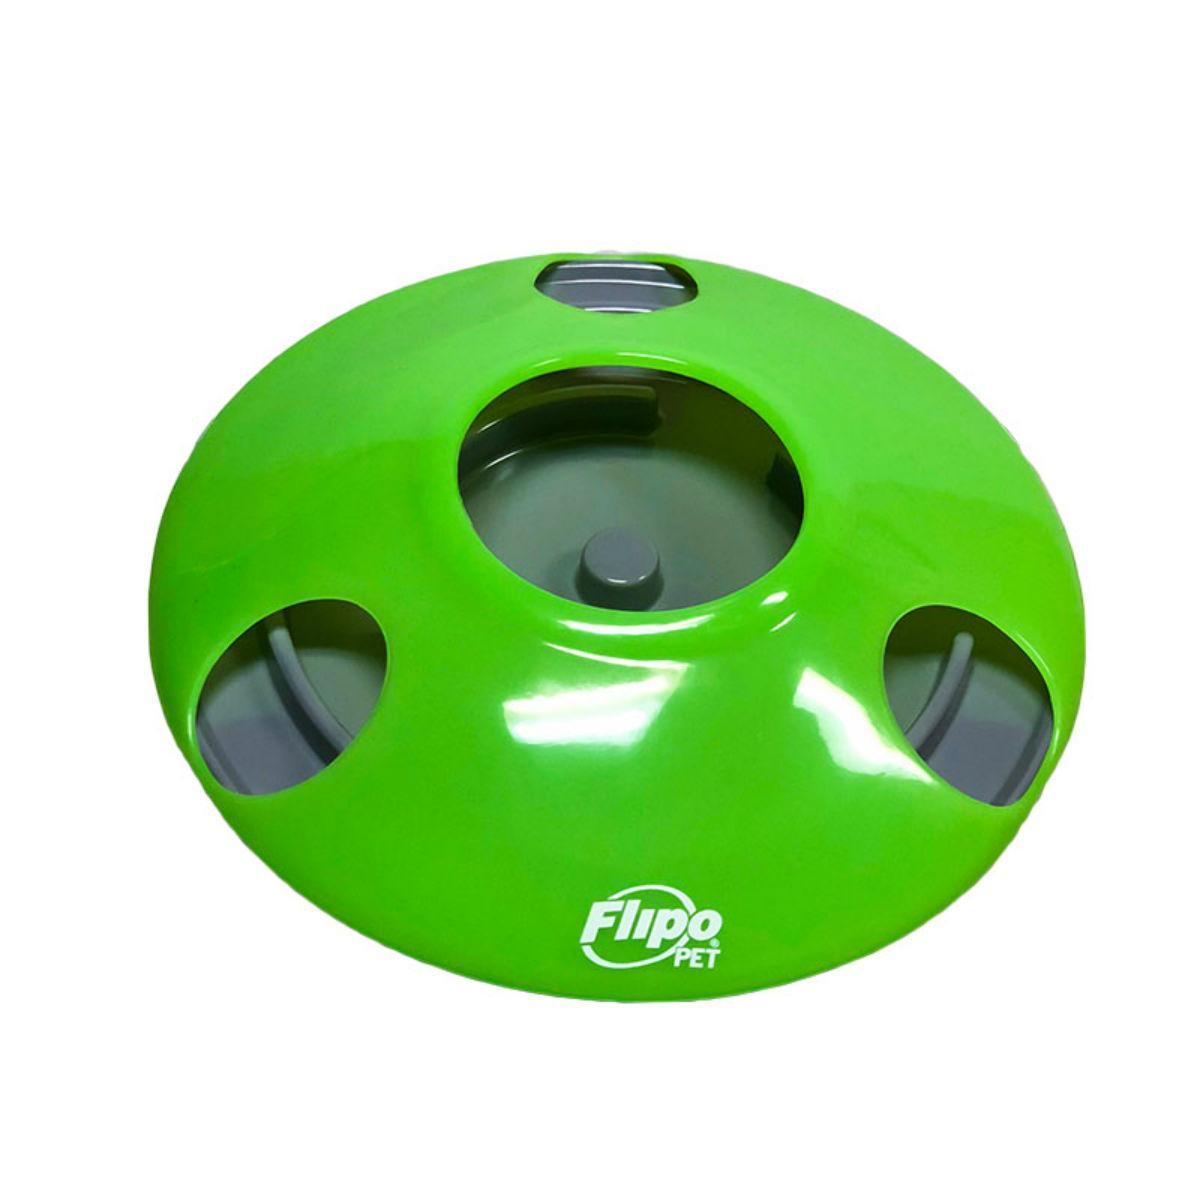 U.F.O. - Ultimate Feeding Object Pet Slow Feeder or Treat Dispenser - Green